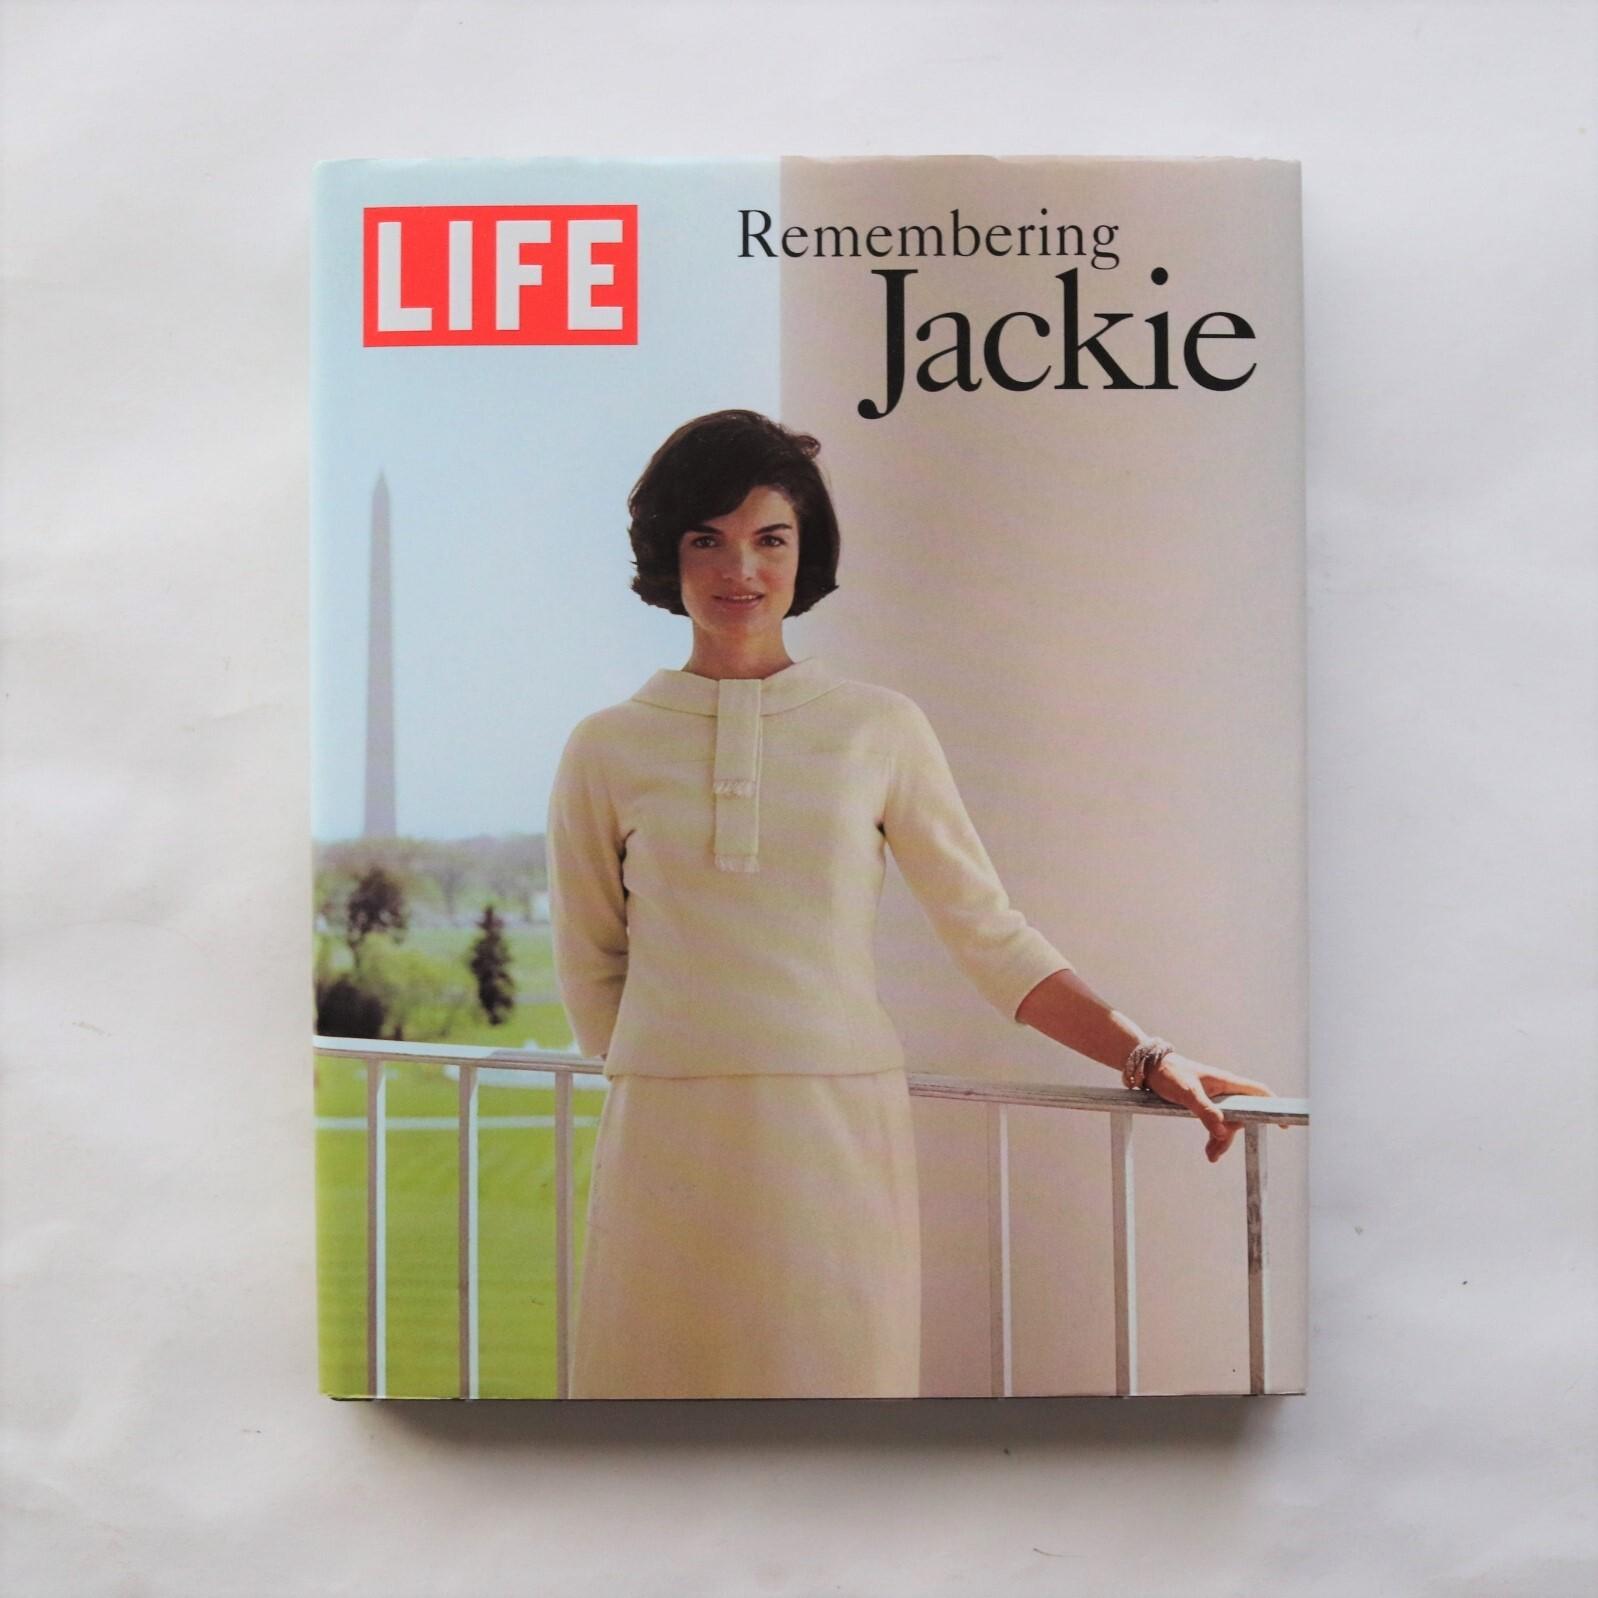 LIFE Remembering Jackie (Life Books)